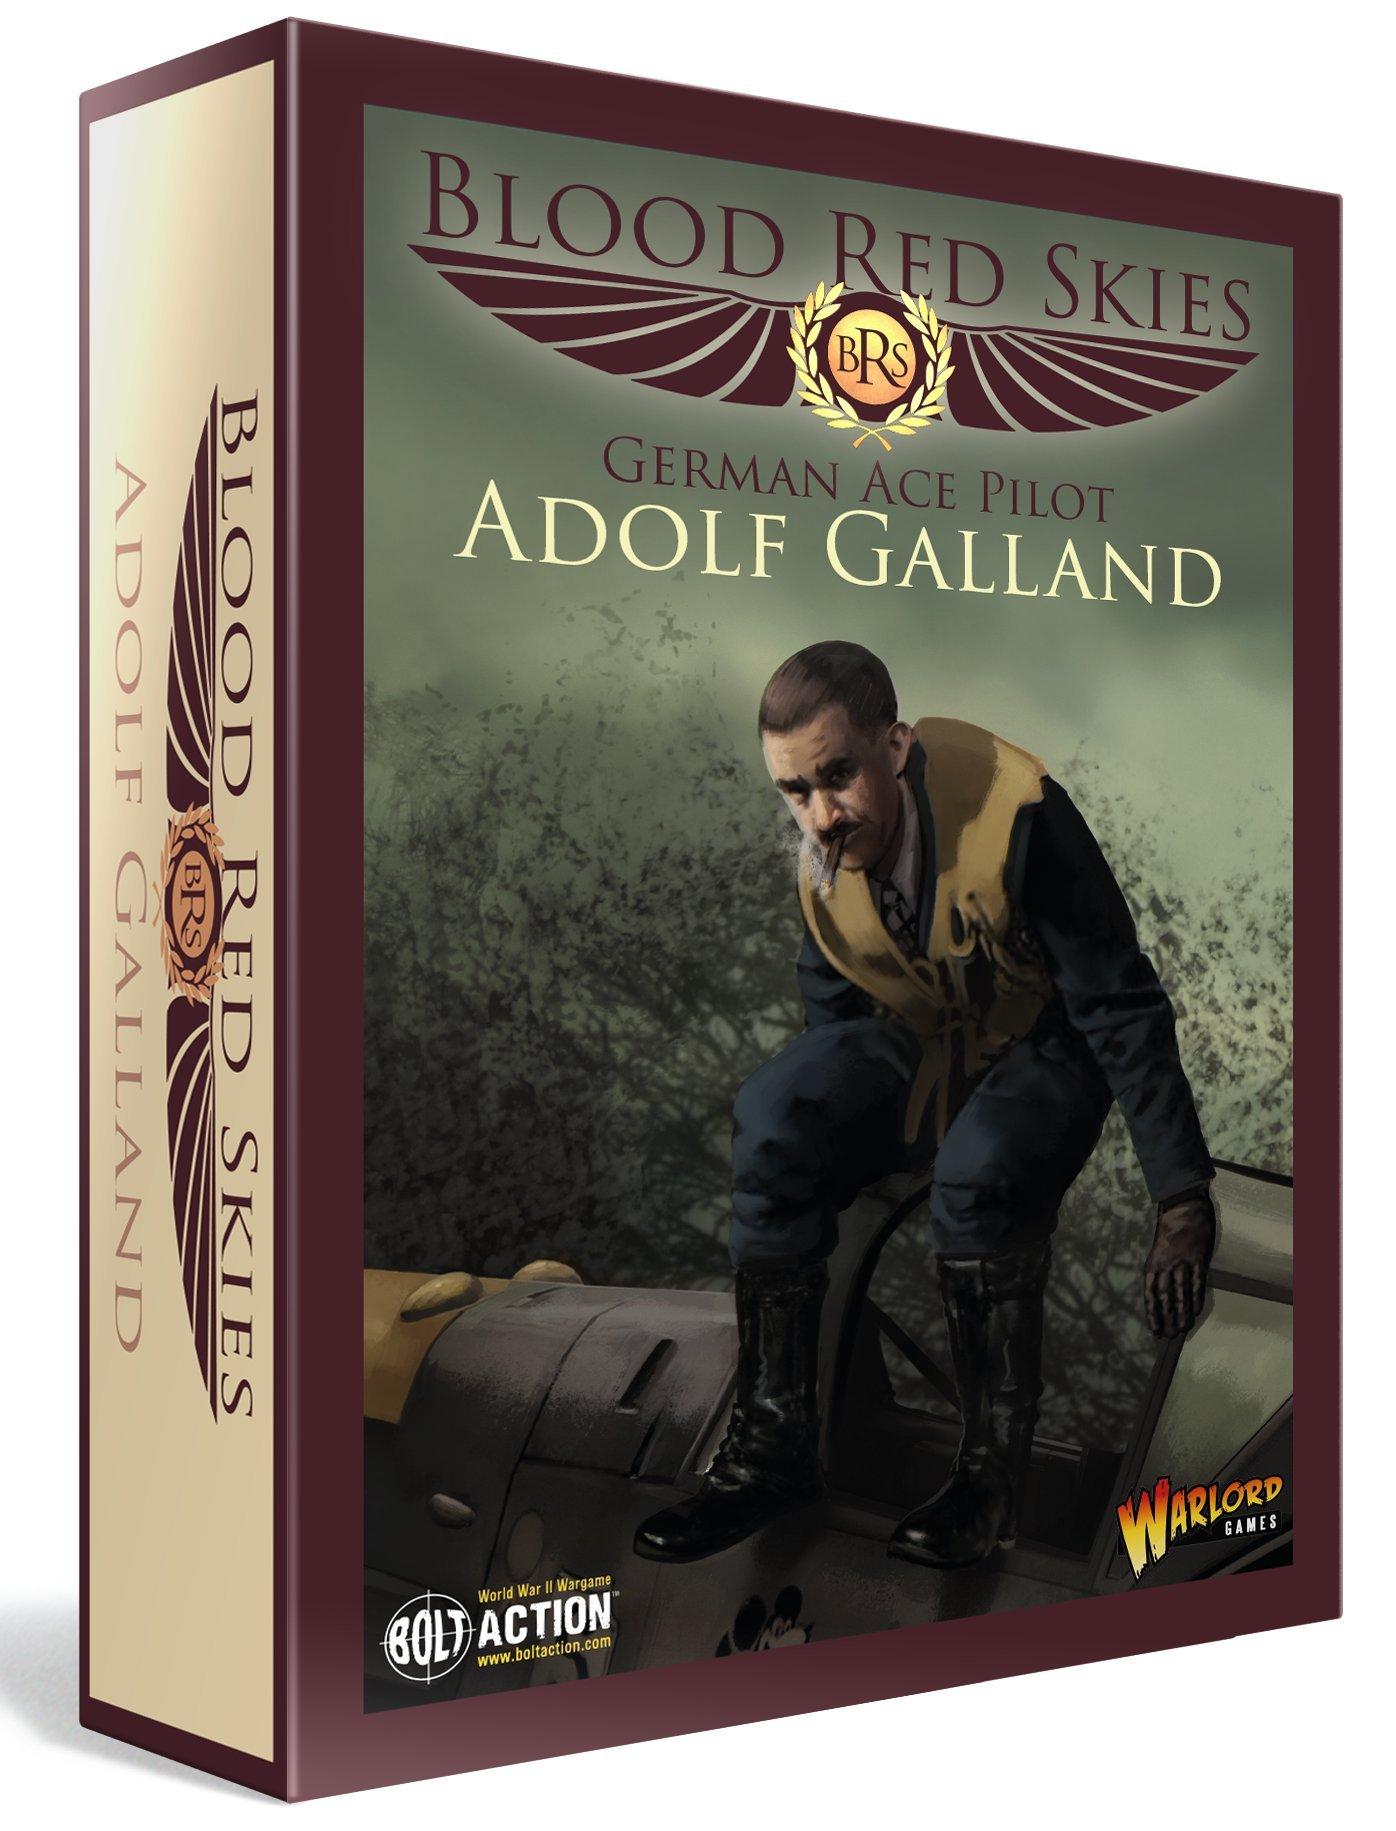 Warlord Games, Blood Red Skies - German Ace Pilot Adolf Galland set - Wargaming miniatures